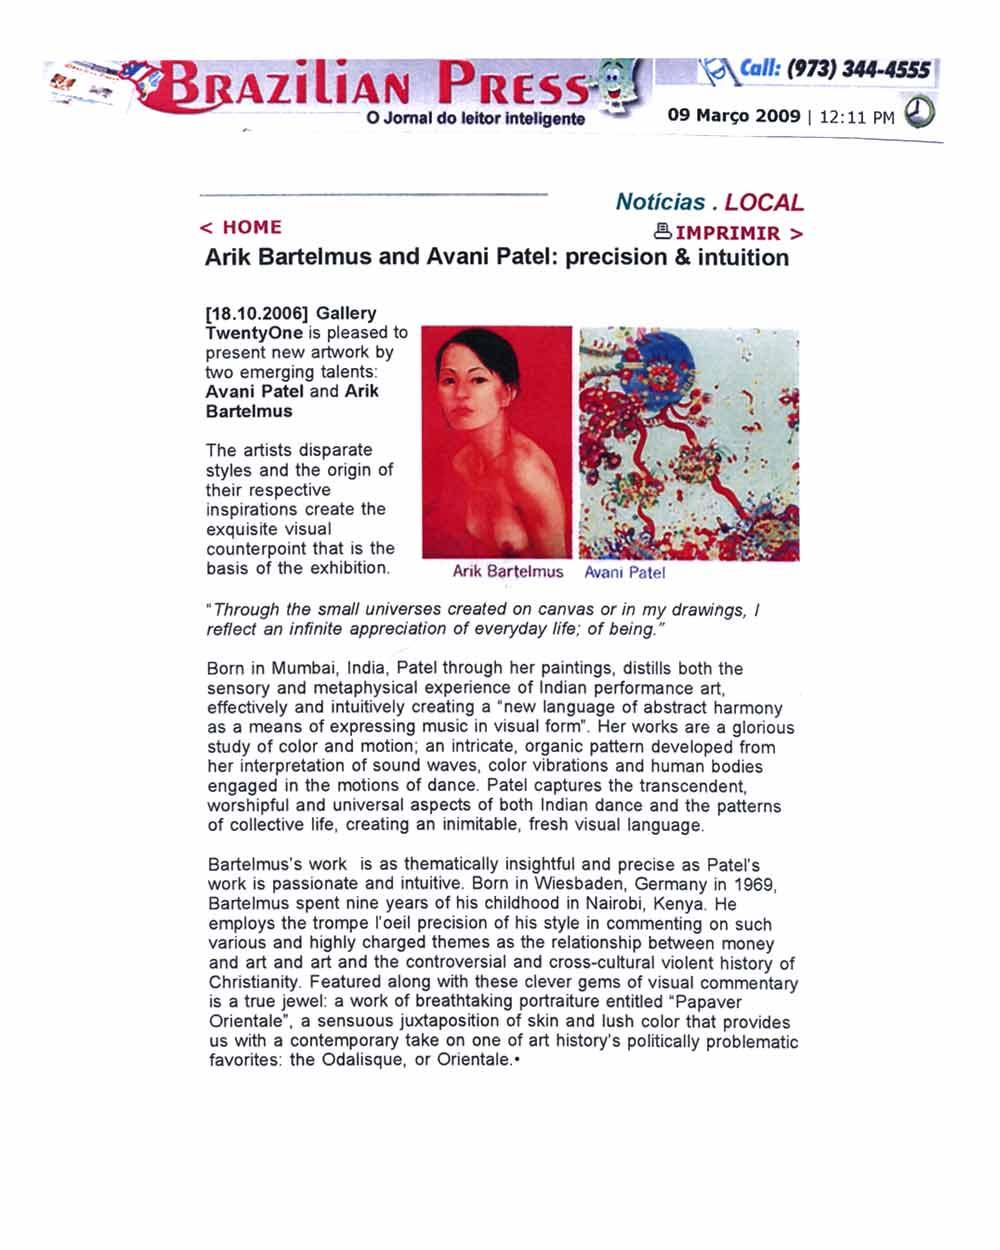 Arik Bartelmus and Avani Patel: precision & intuition, press release